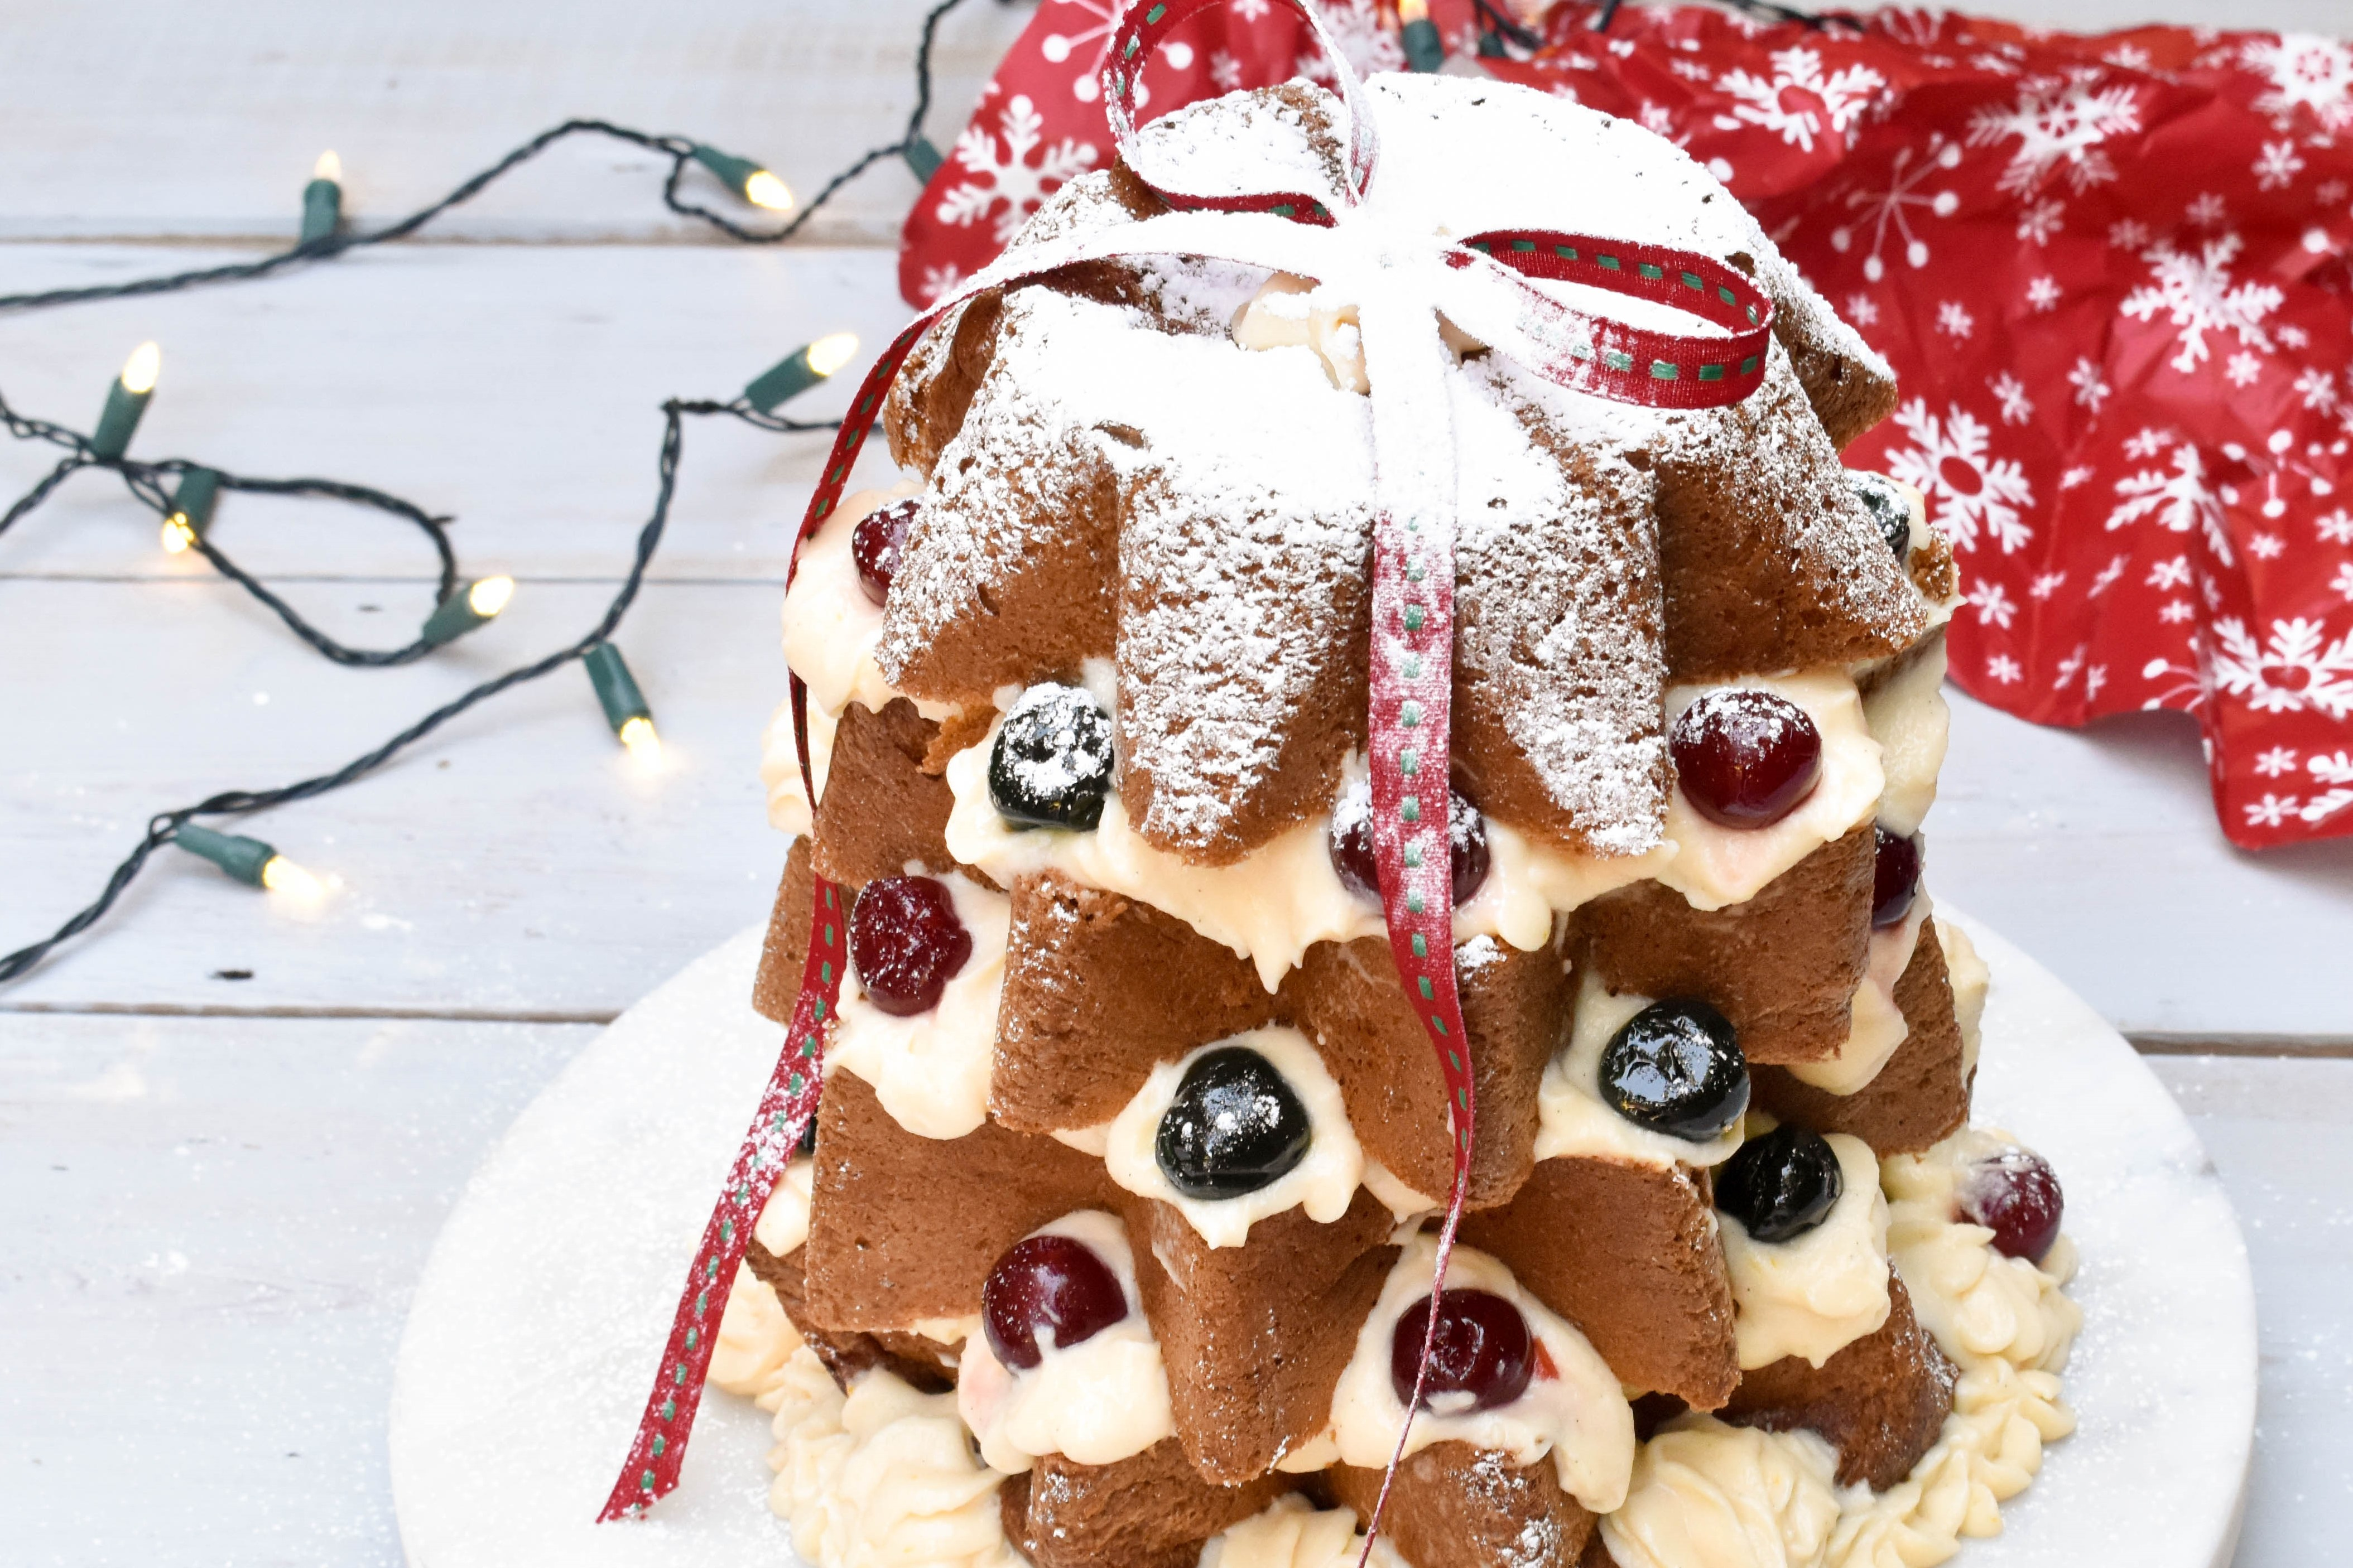 Italian Christmas menu ideas